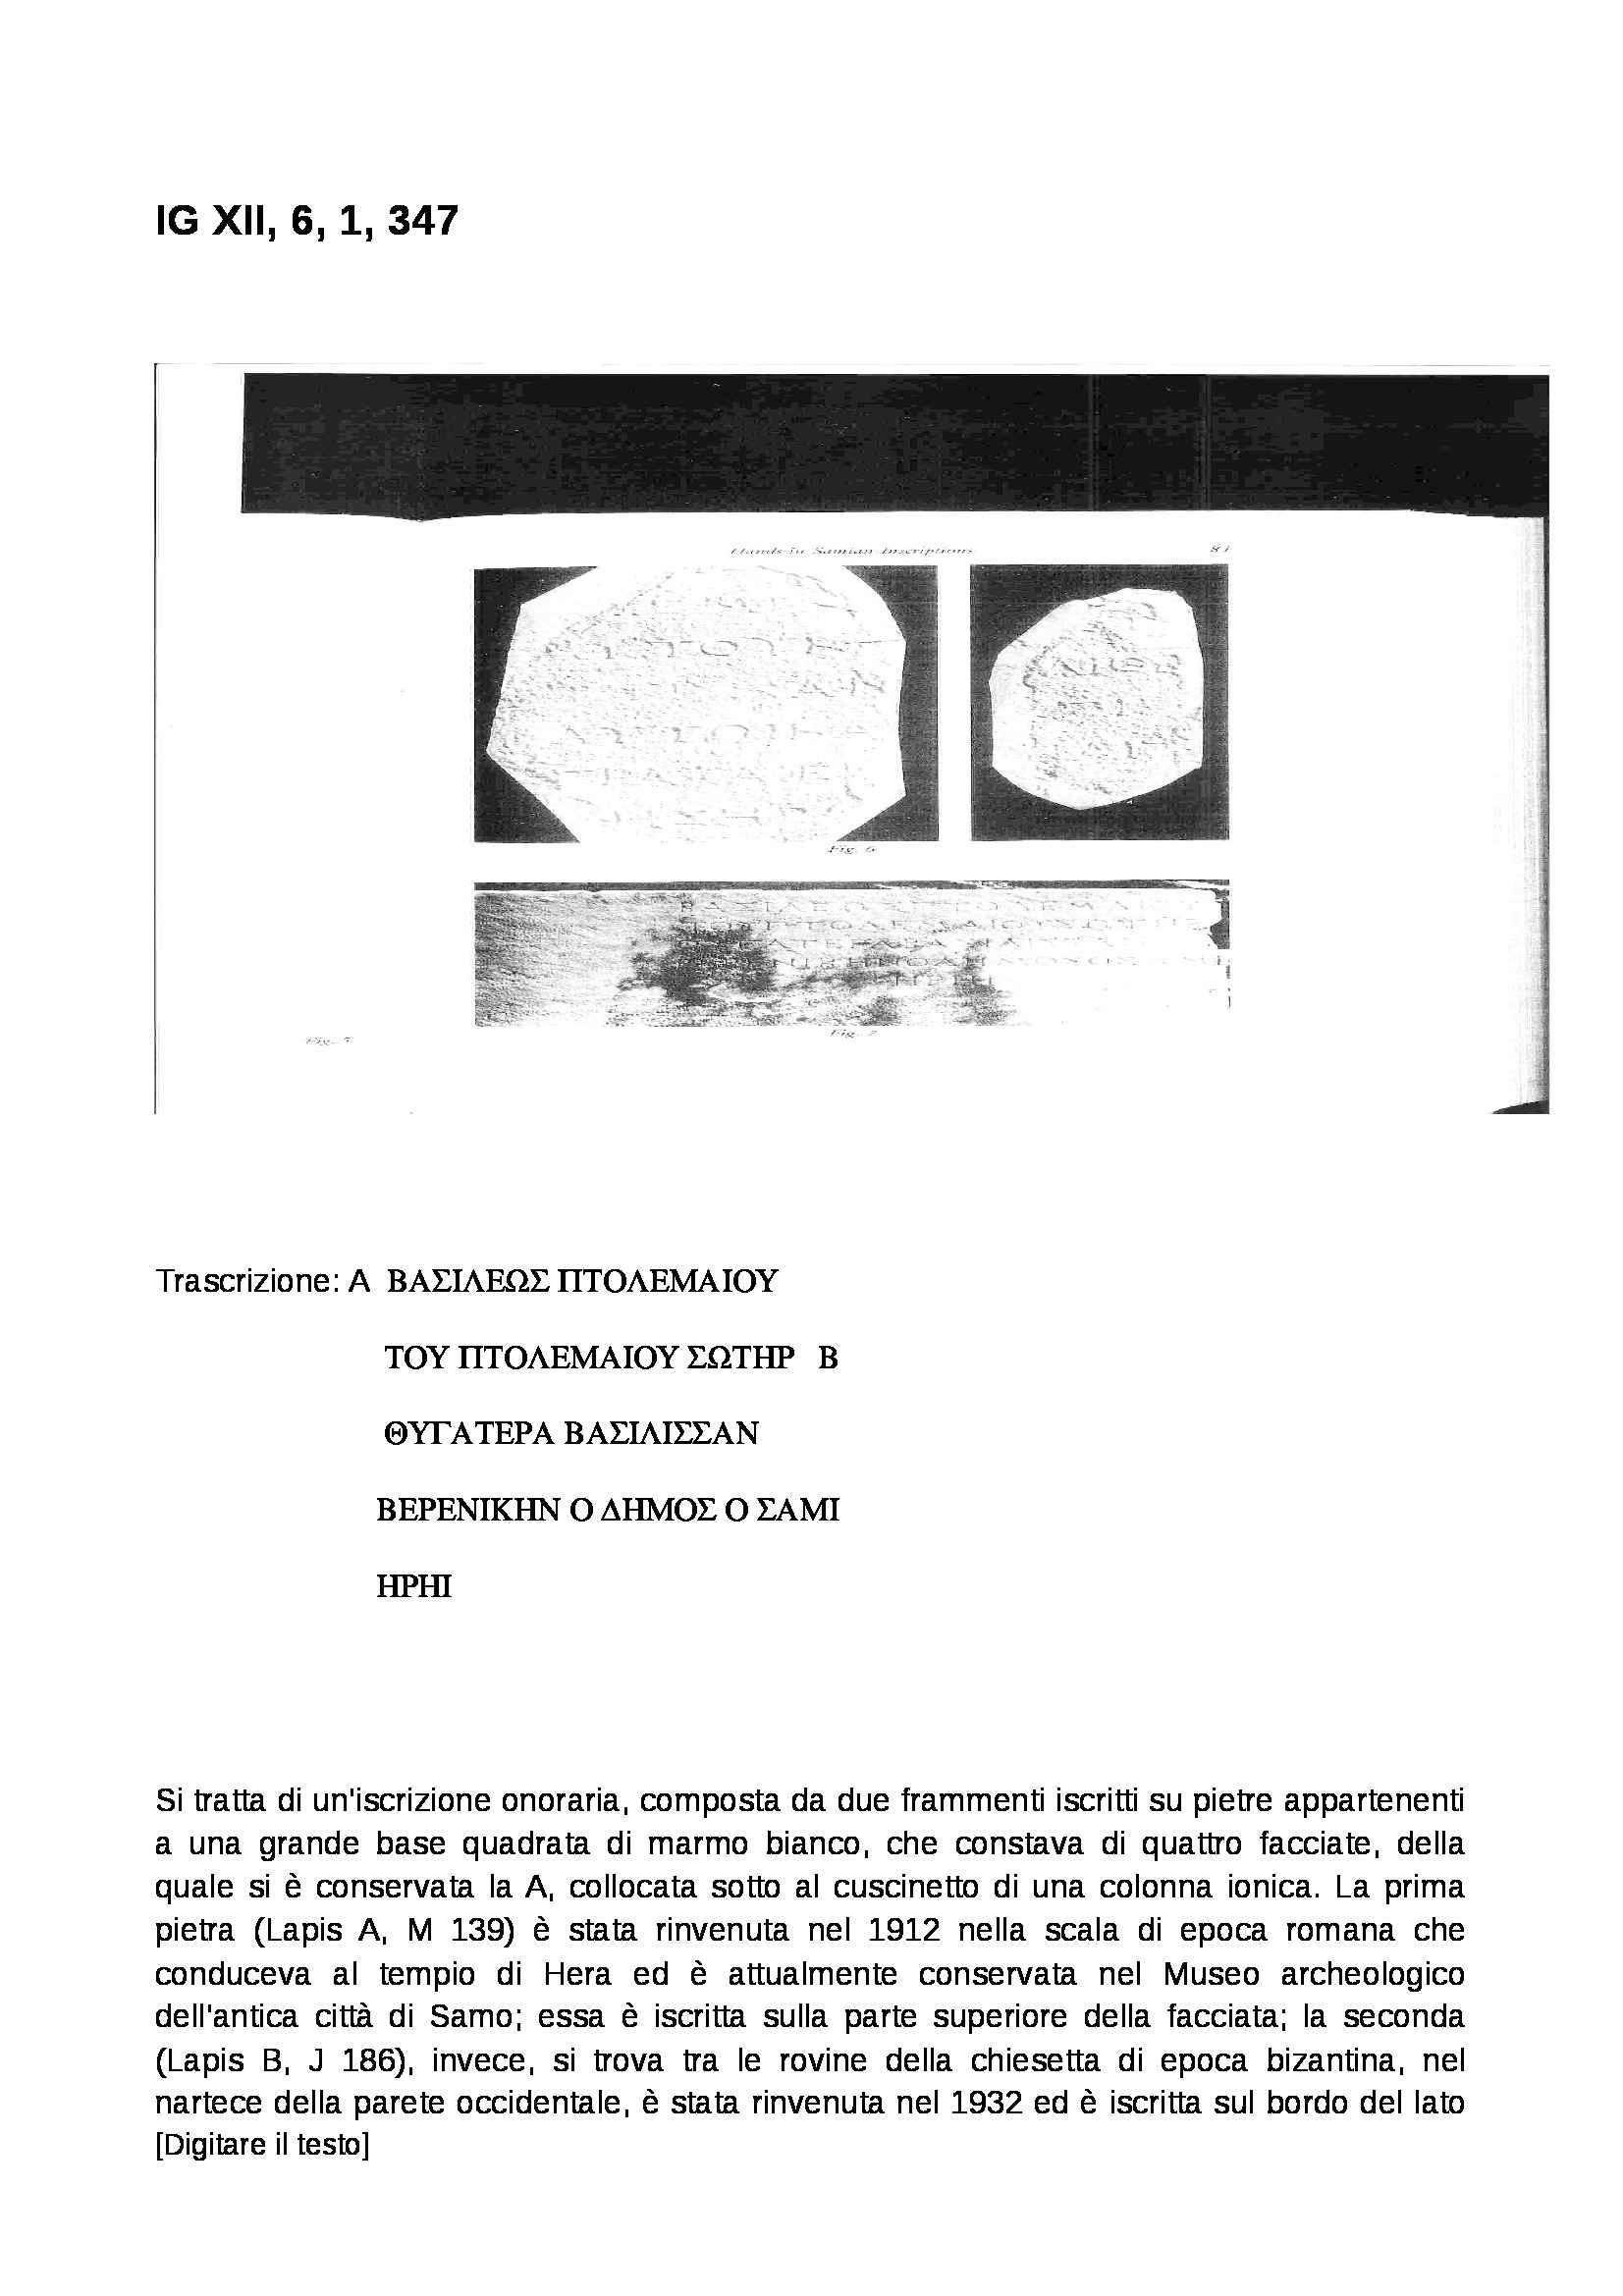 "Epigrafia greca - esercitazione sull'epigrafe ""IG XII, 6, 1, 347"